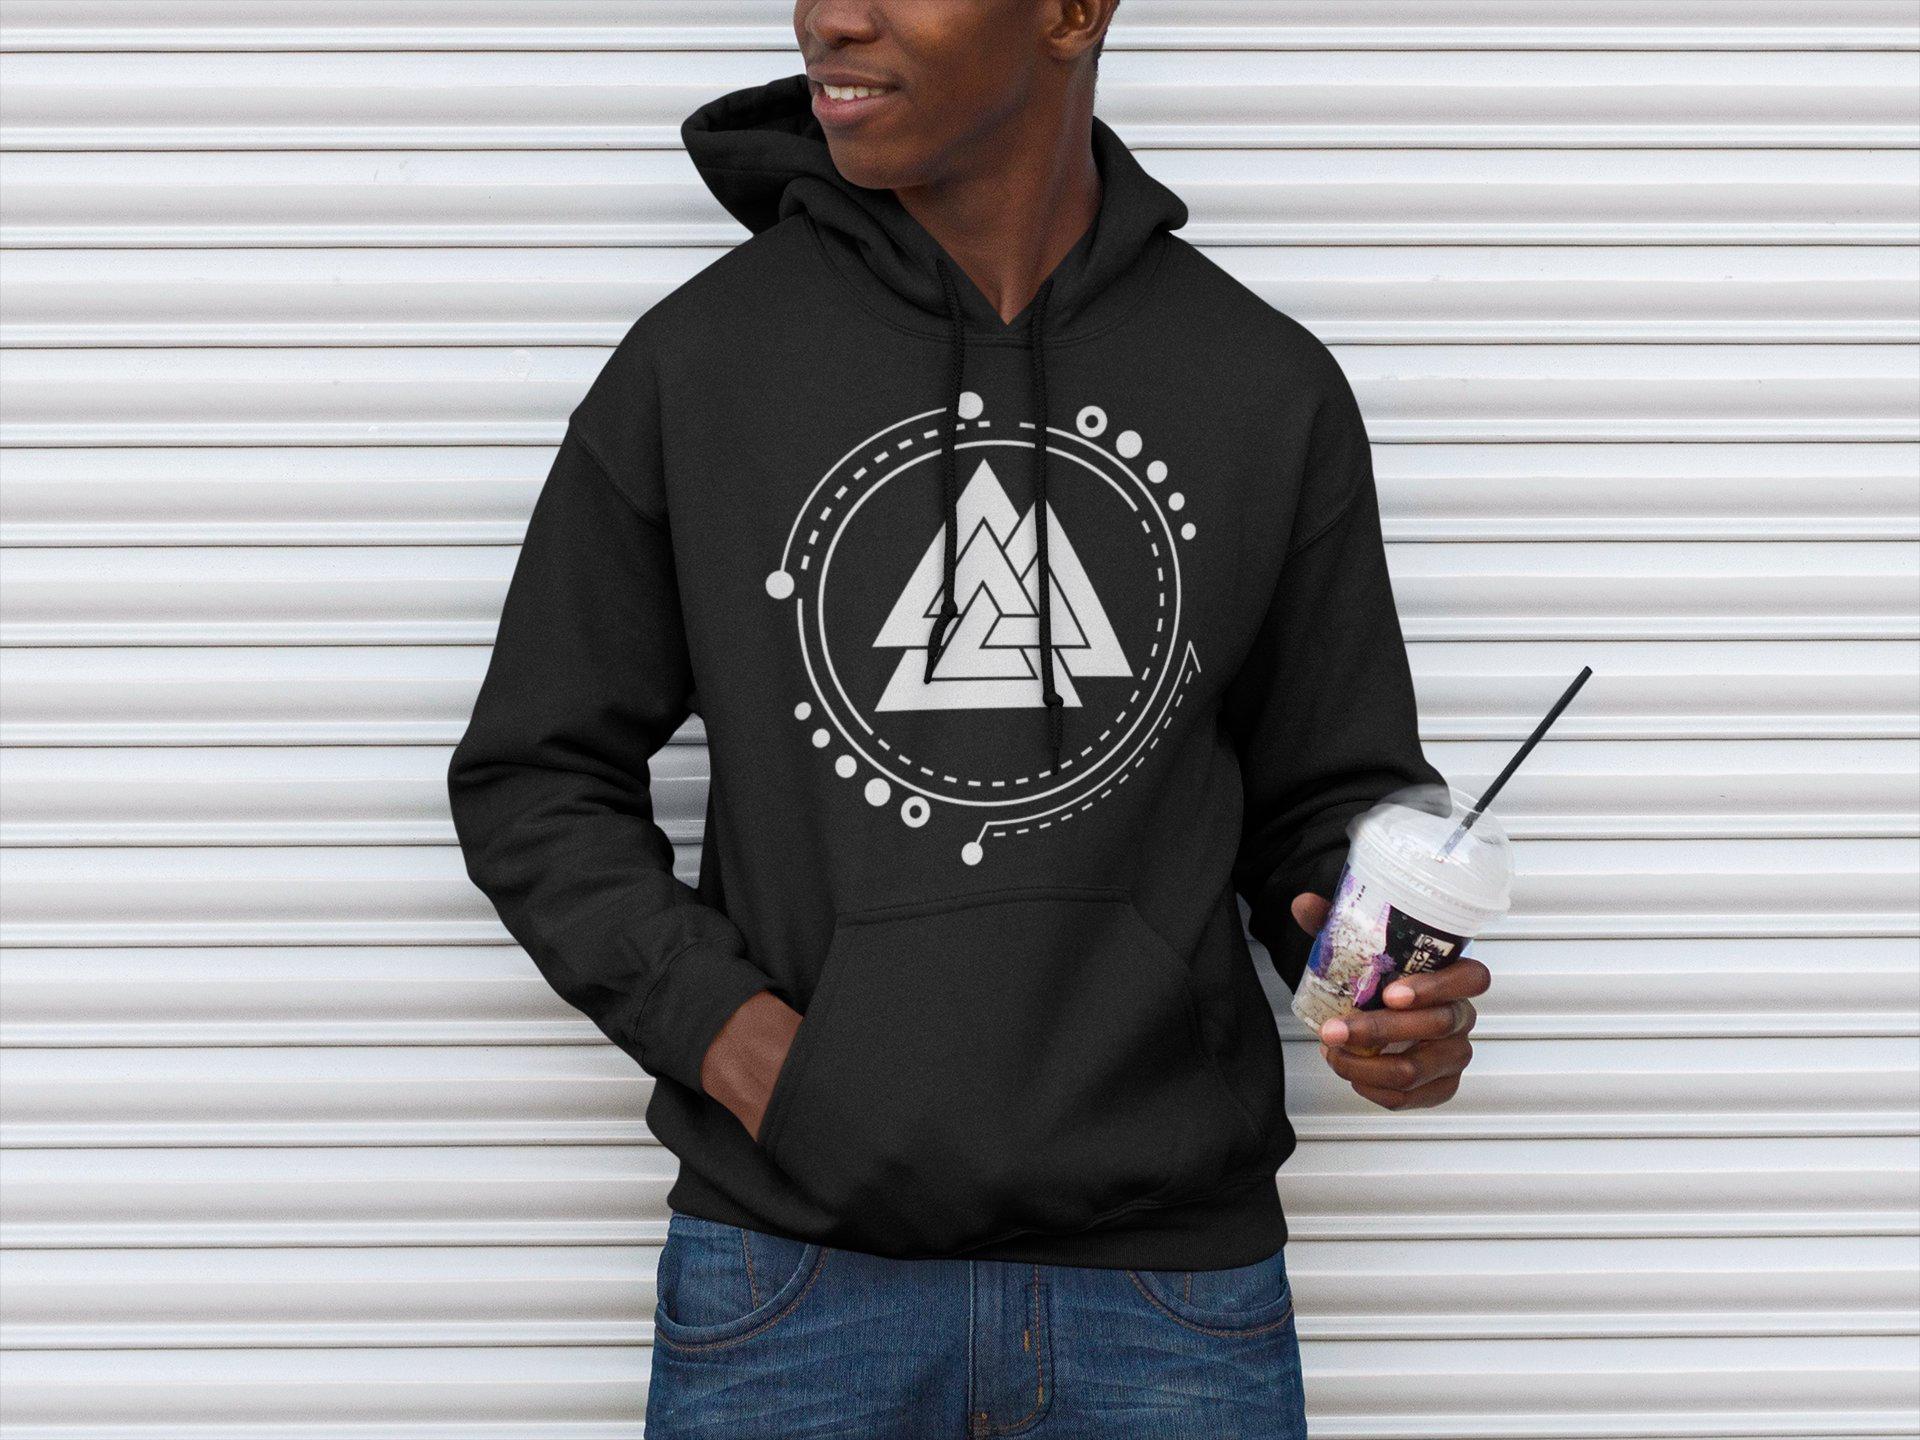 79266d8a Valknut | Norse Pagan Symbol | Unisex Heavy Blend Crewneck Sweatshirt /  Hoodie | Viking Clothing | Odin's Knot | Father's Day Gift | Heathen